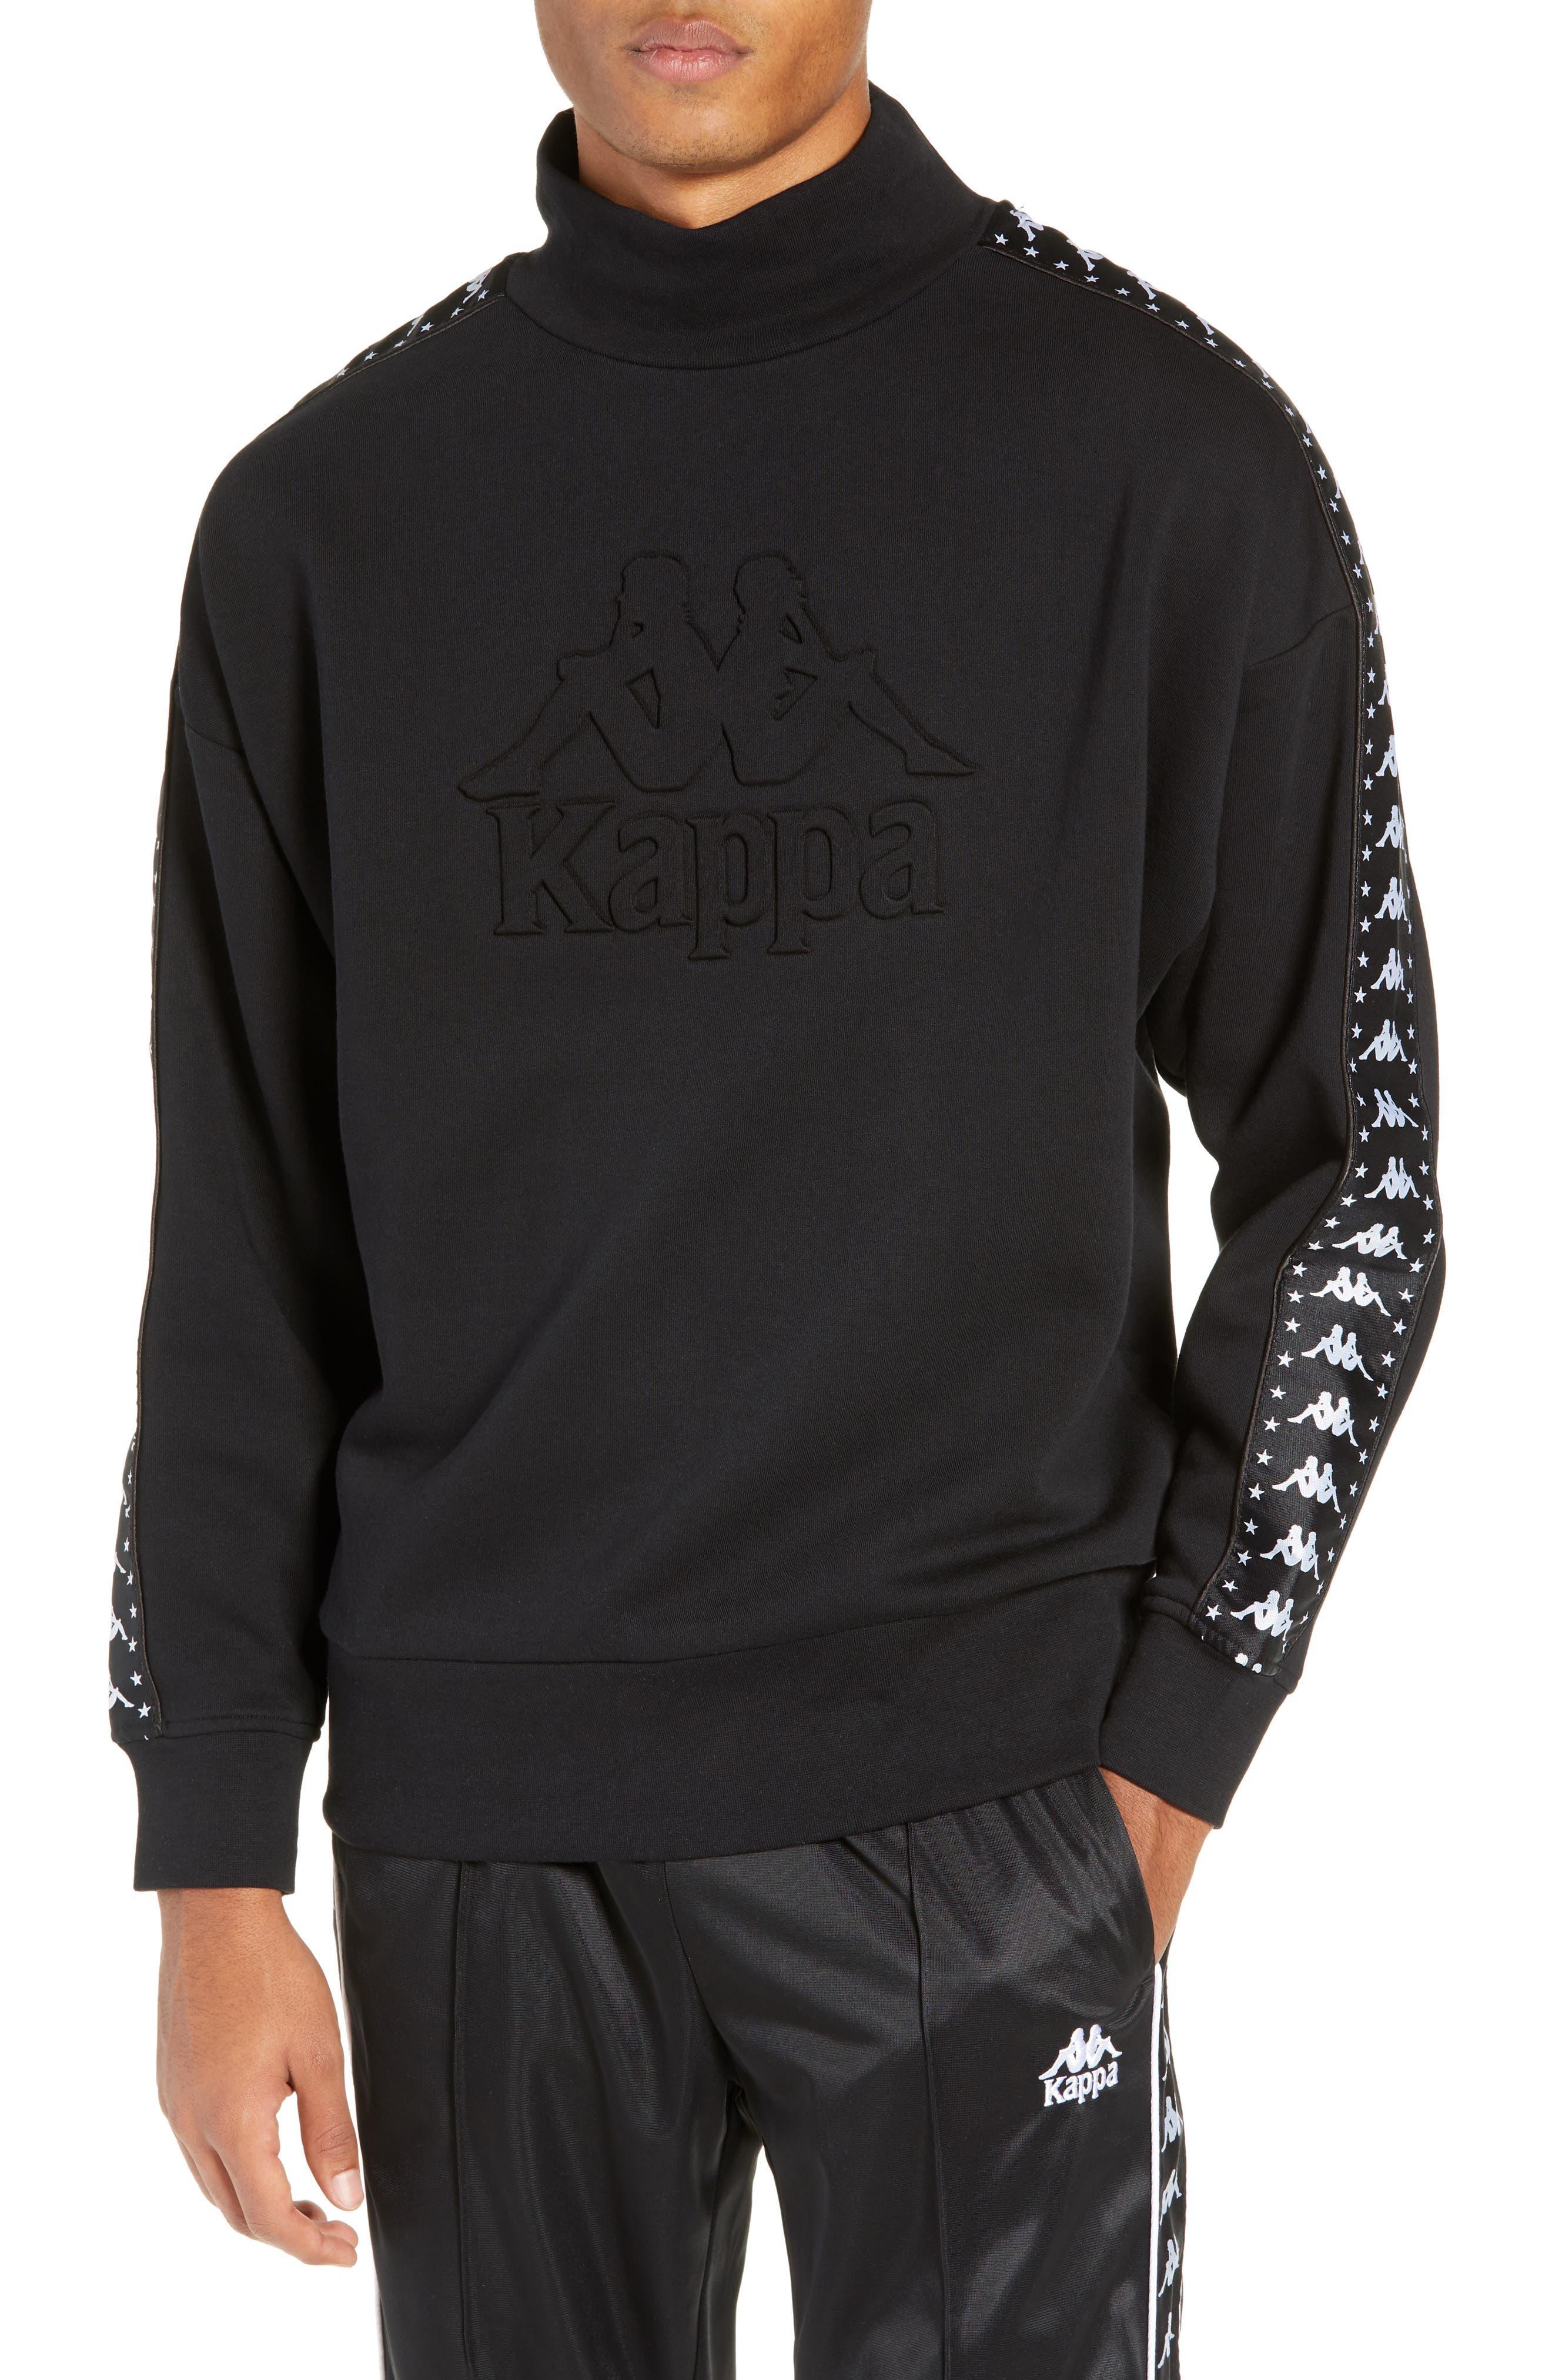 Authentic Alef Mock Neck Sweatshirt,                             Main thumbnail 1, color,                             BLACK/ WHITE